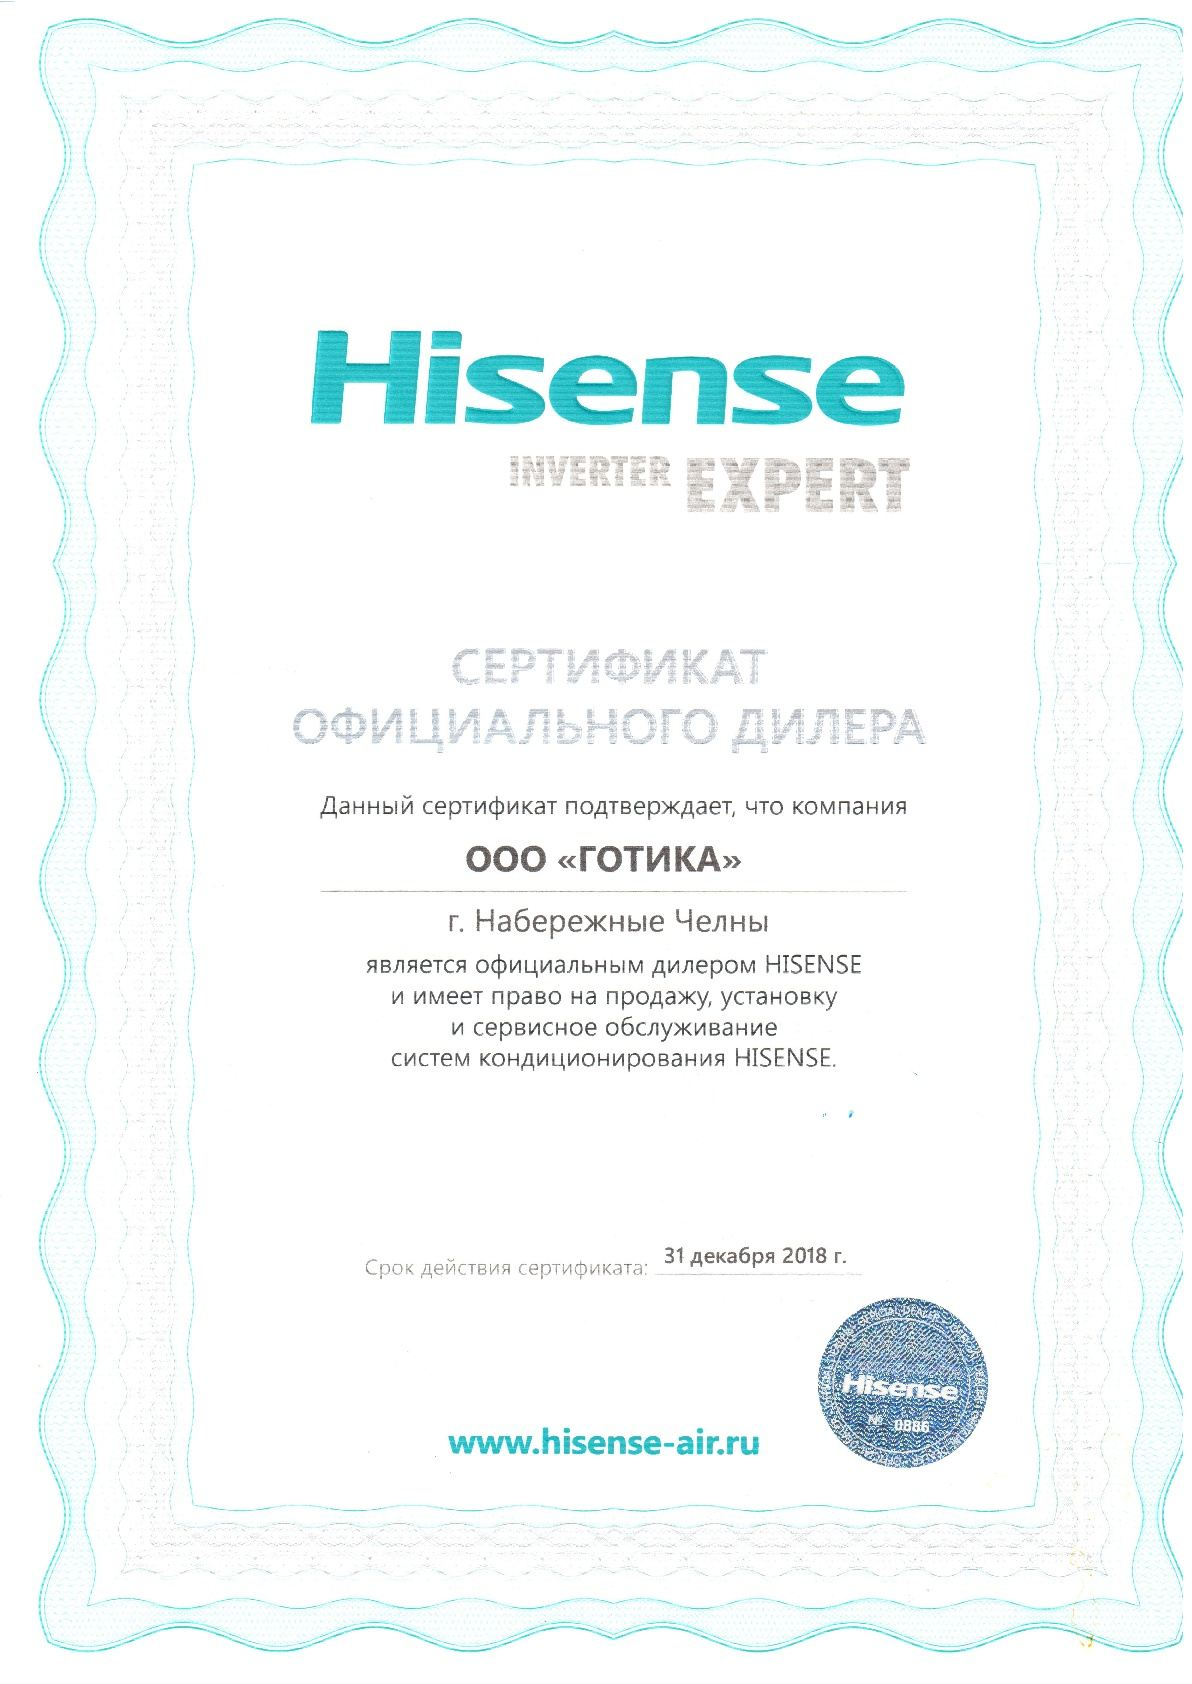 Сертификат Hisense